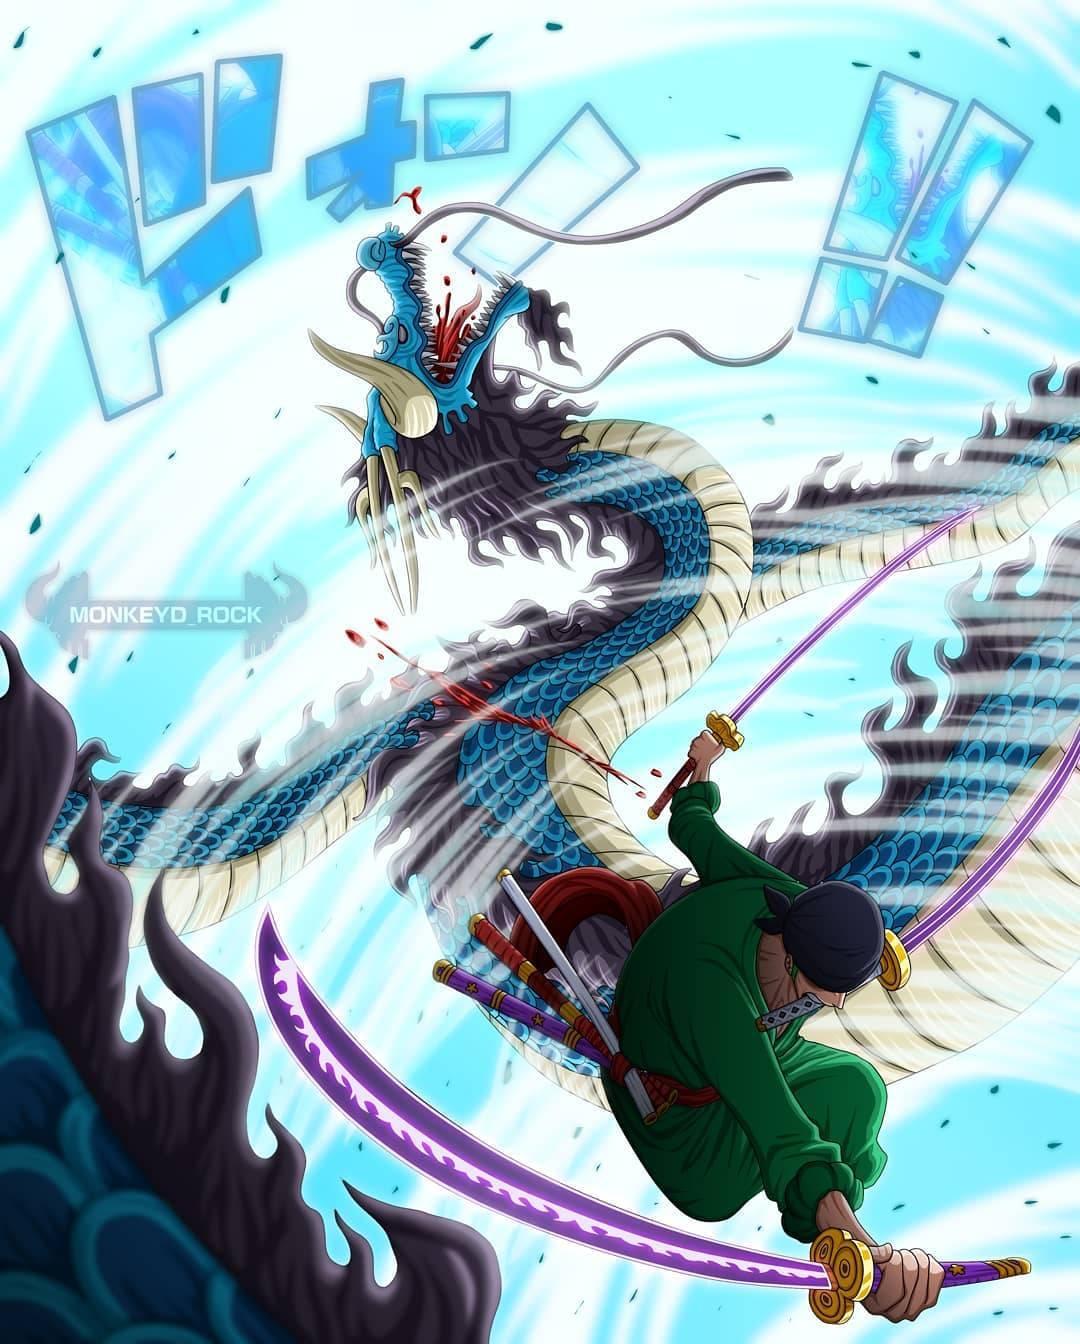 Download Wallpaper Wallpaper anime ultra hd